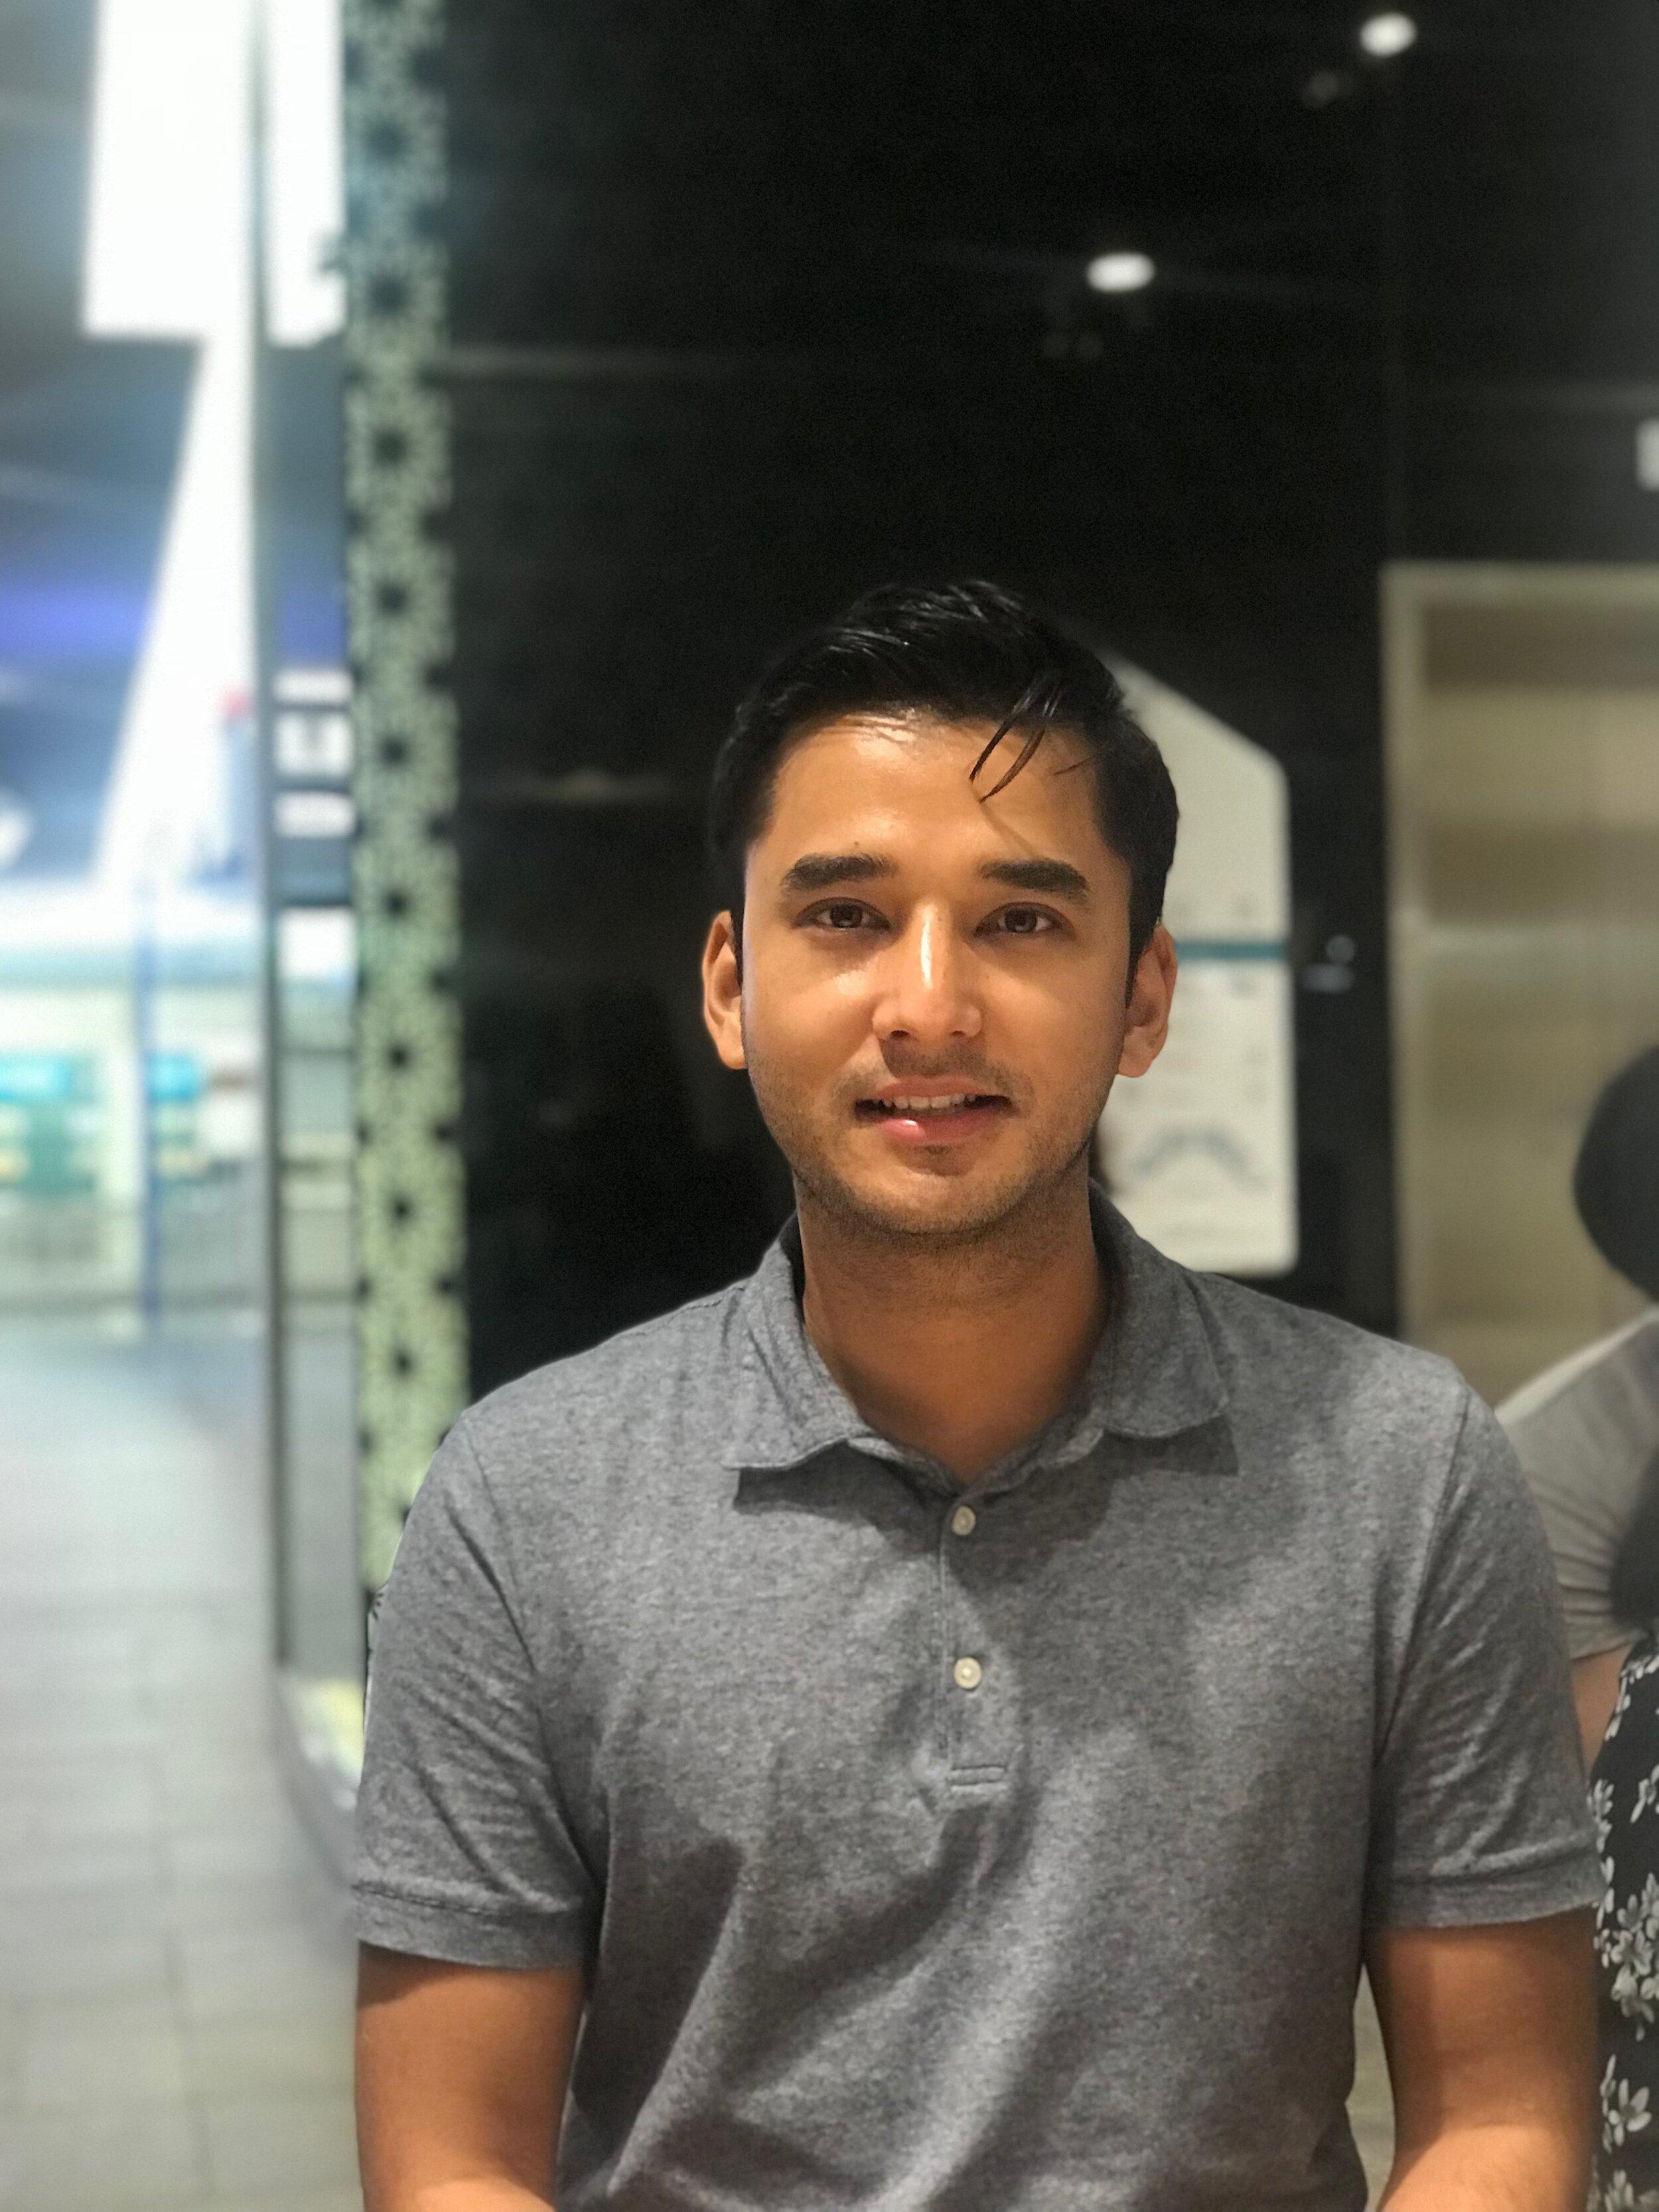 Bhavin Pradhan    Graduate Research Assistant Ph.D. Public Affairs Student  Contact:  pradh048@umn.edu